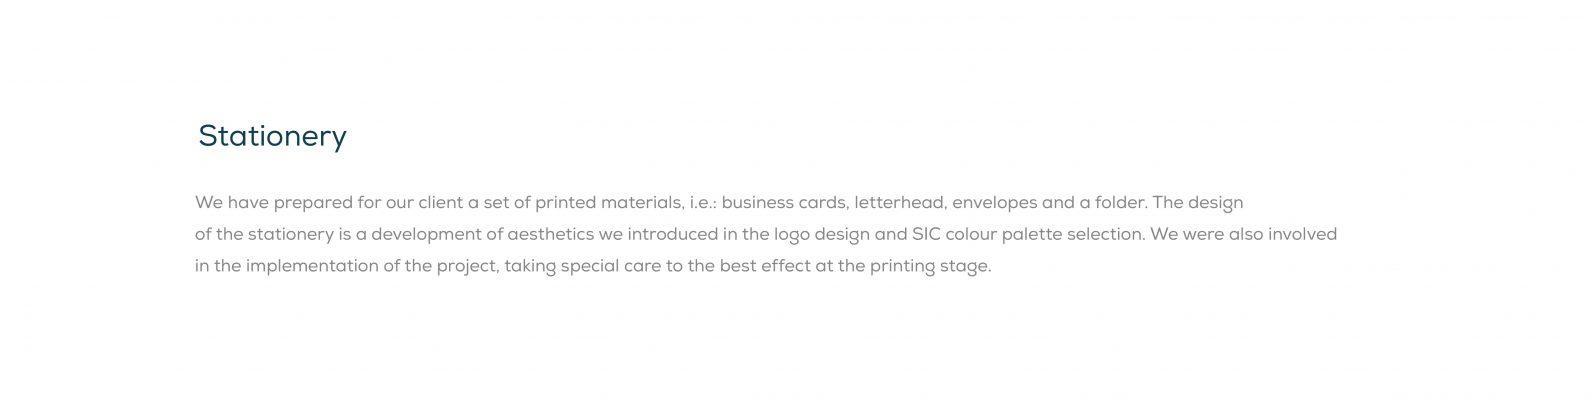 SIC — Global Textiles